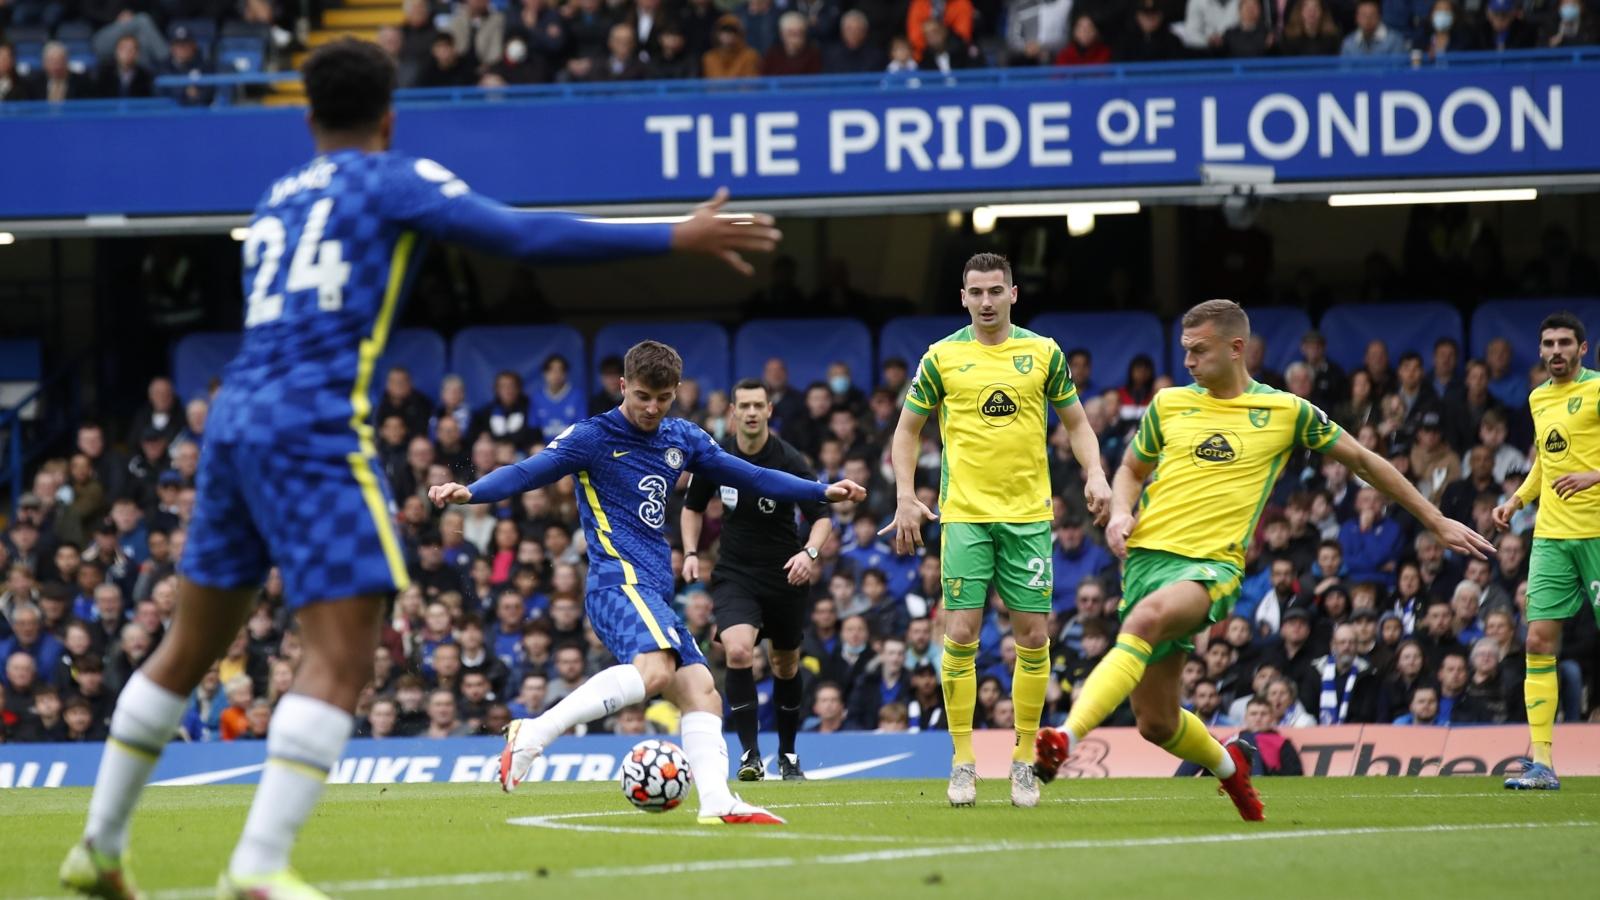 Trực tiếp Chelsea 1 - 0 Norwich: Mason Mount mở tỷ số